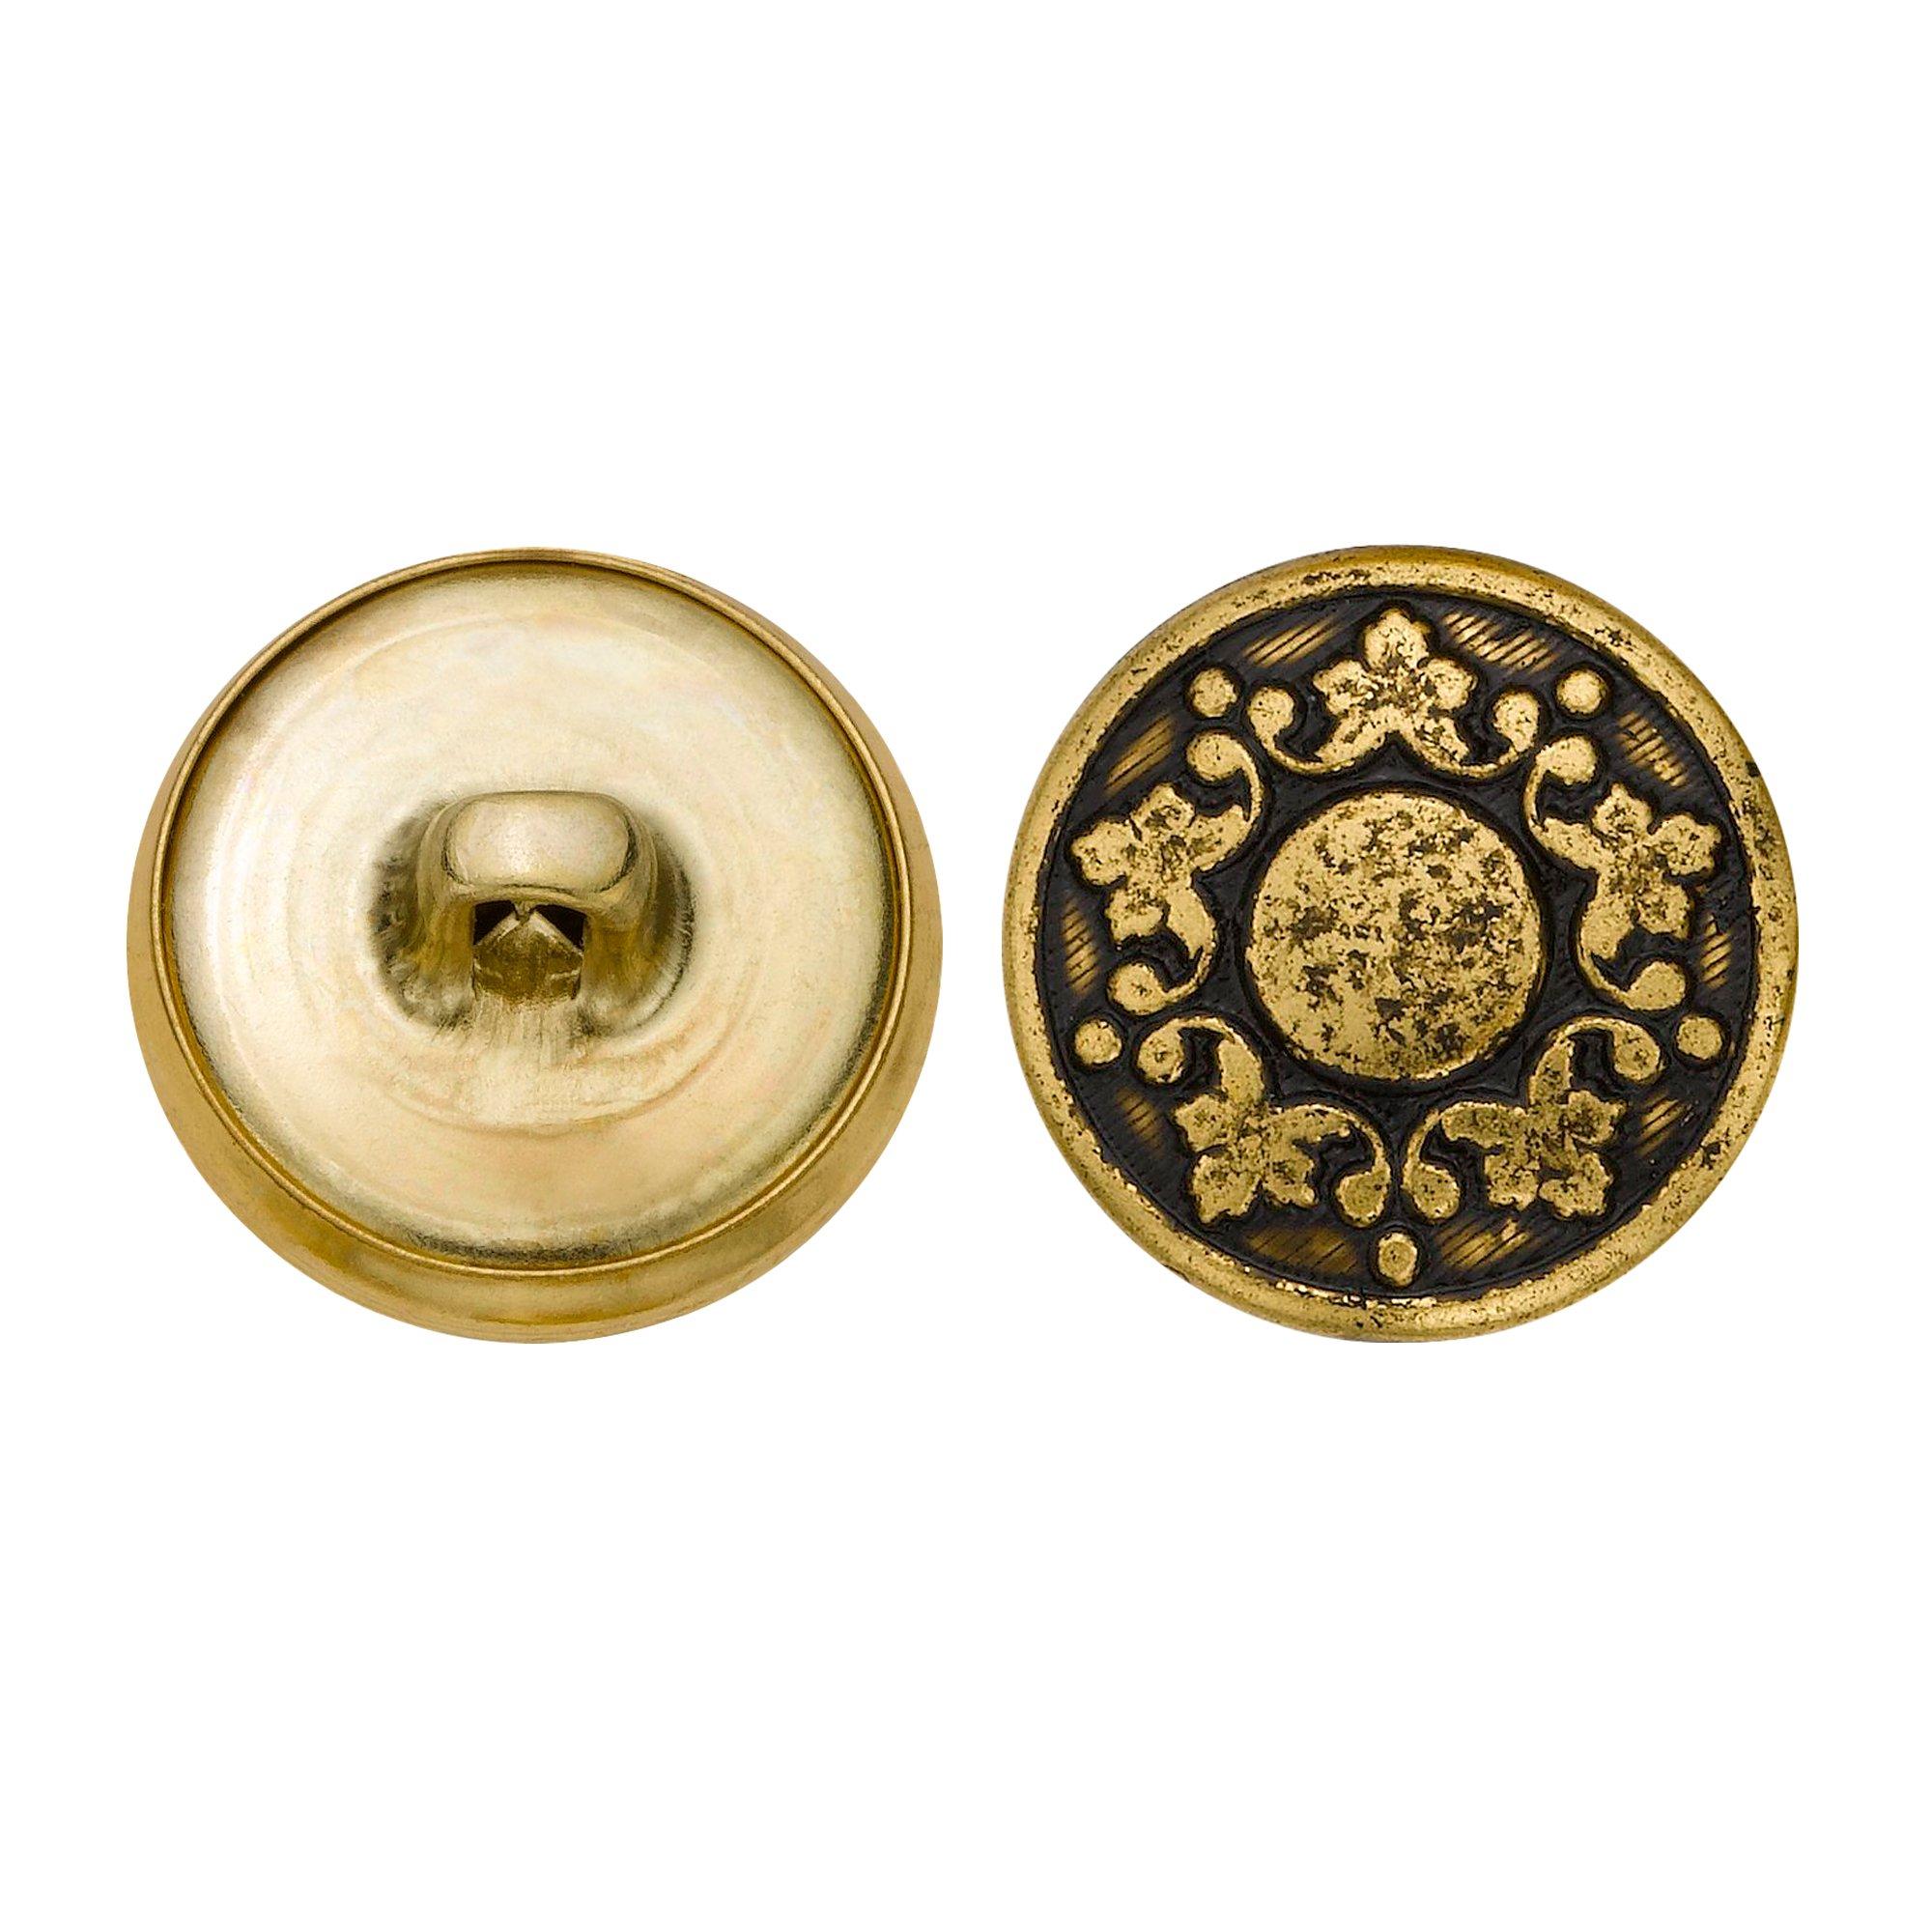 C&C Metal Products 5339 Abstract Grape Vine Metal Button, Size 30 Ligne, Antique Gold, 36-Pack